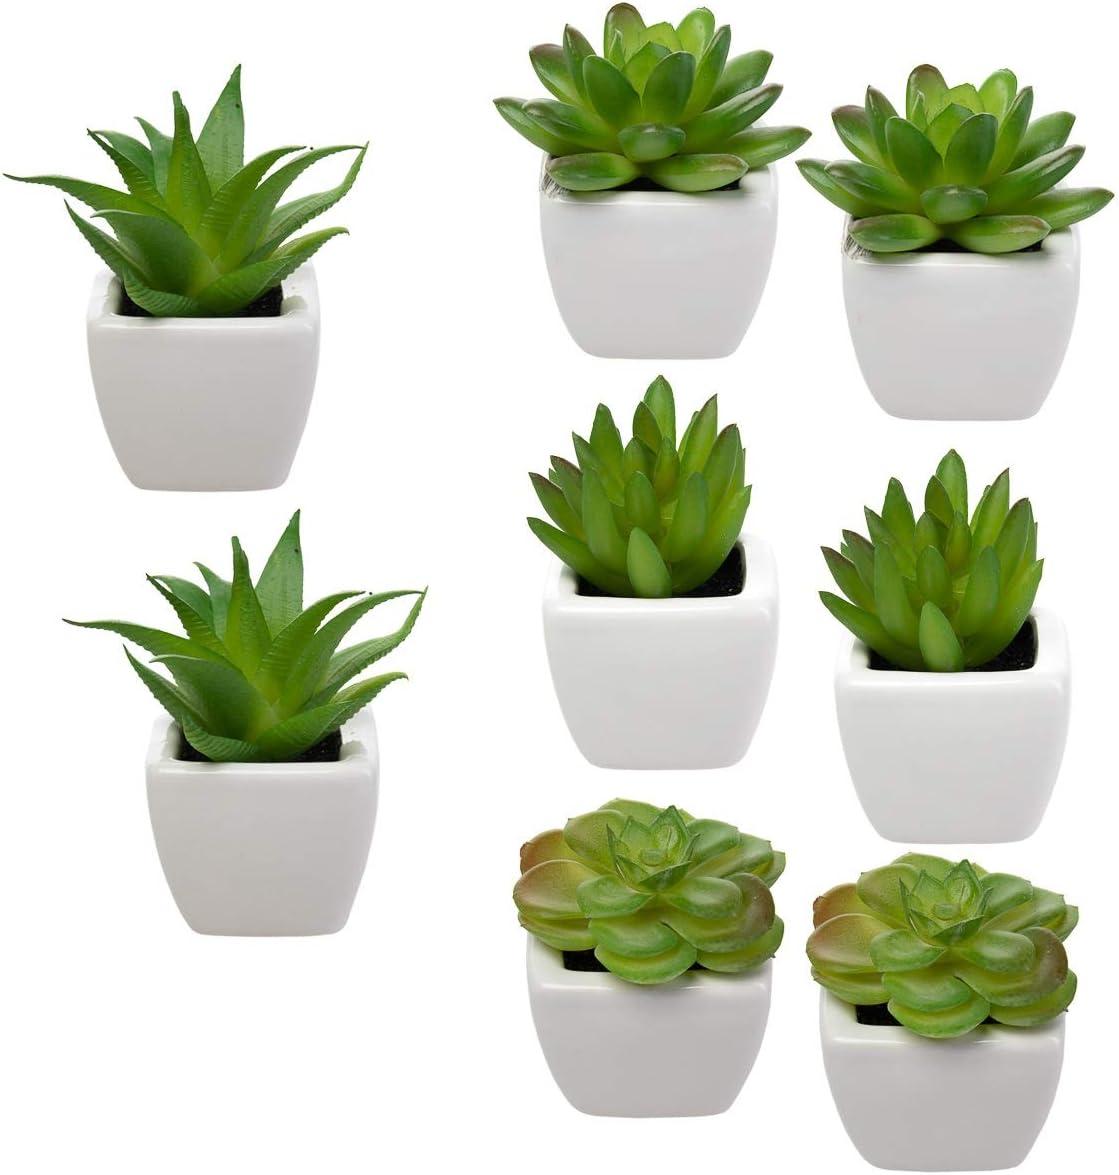 Amazon Com Home Trends Set Of 8 Green Succulents Artificial Mini Succulent Plants Faux Succulents Potted In White Ceramic Pots Home Kitchen